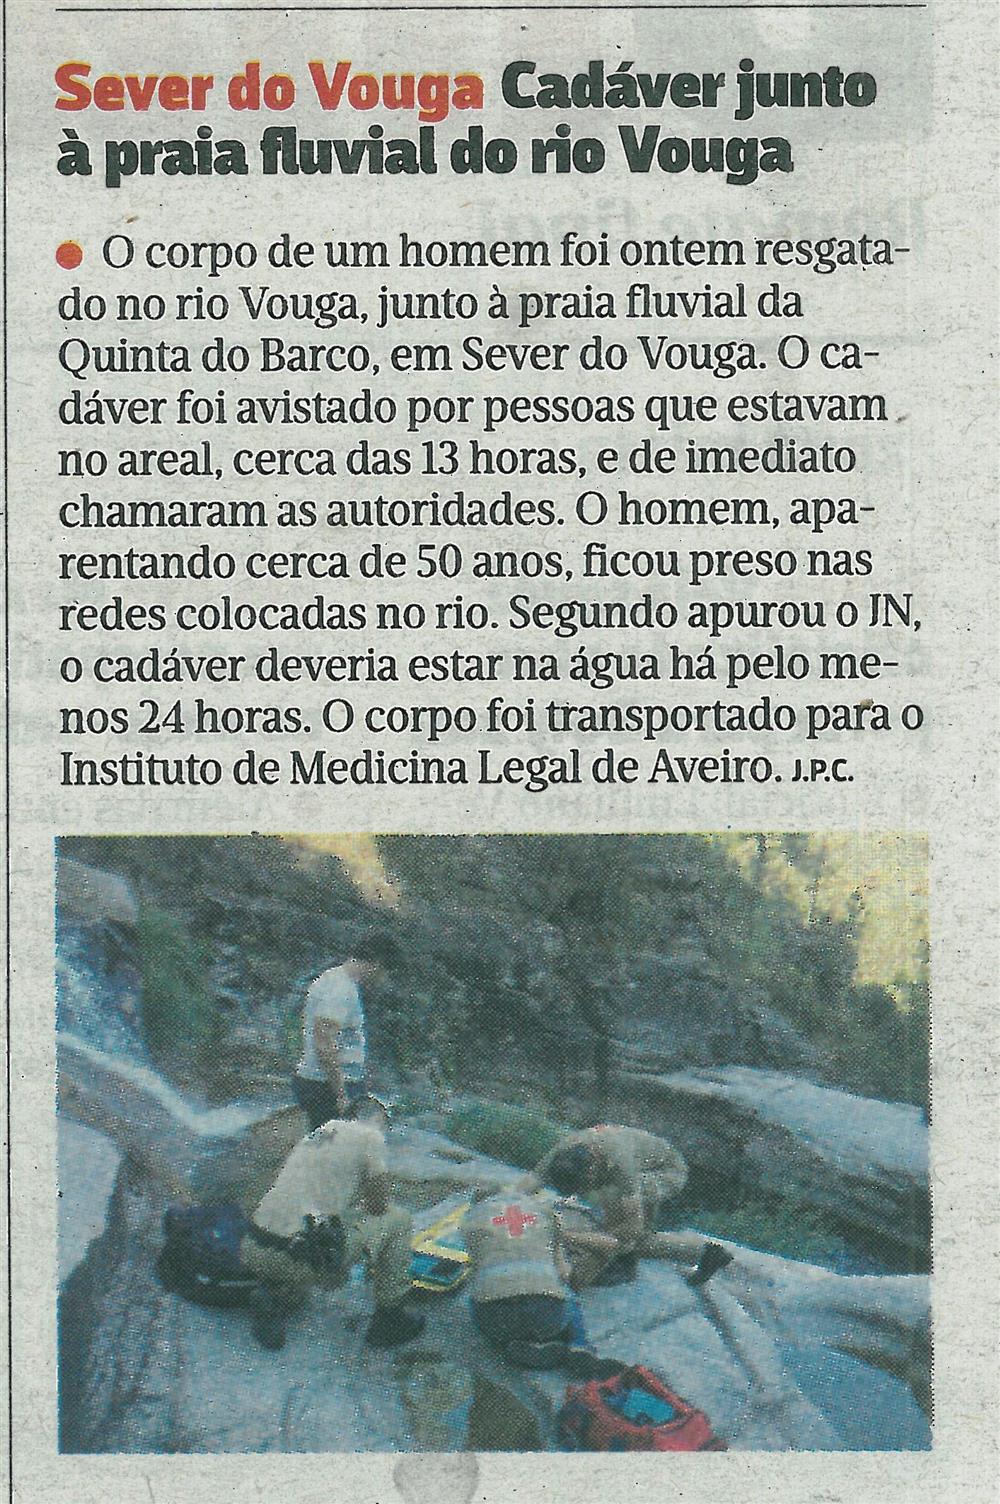 JN-22ago.'16-p.48-Sever do Vouga : cadáver junto à praia fluvial do rio Vouga.jpg